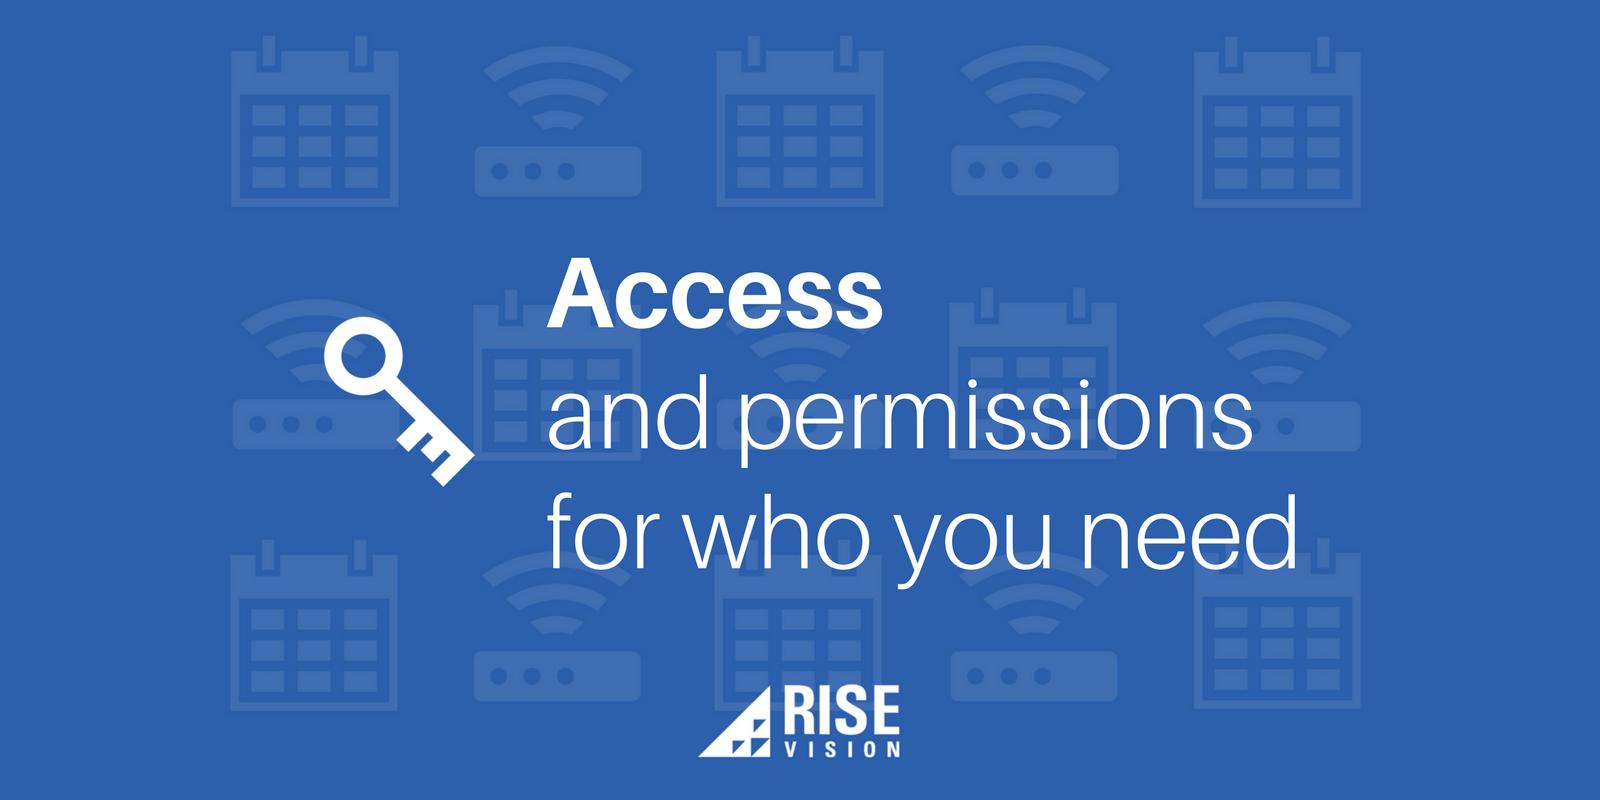 Rise Vision Digital Signage Education User Roles.png